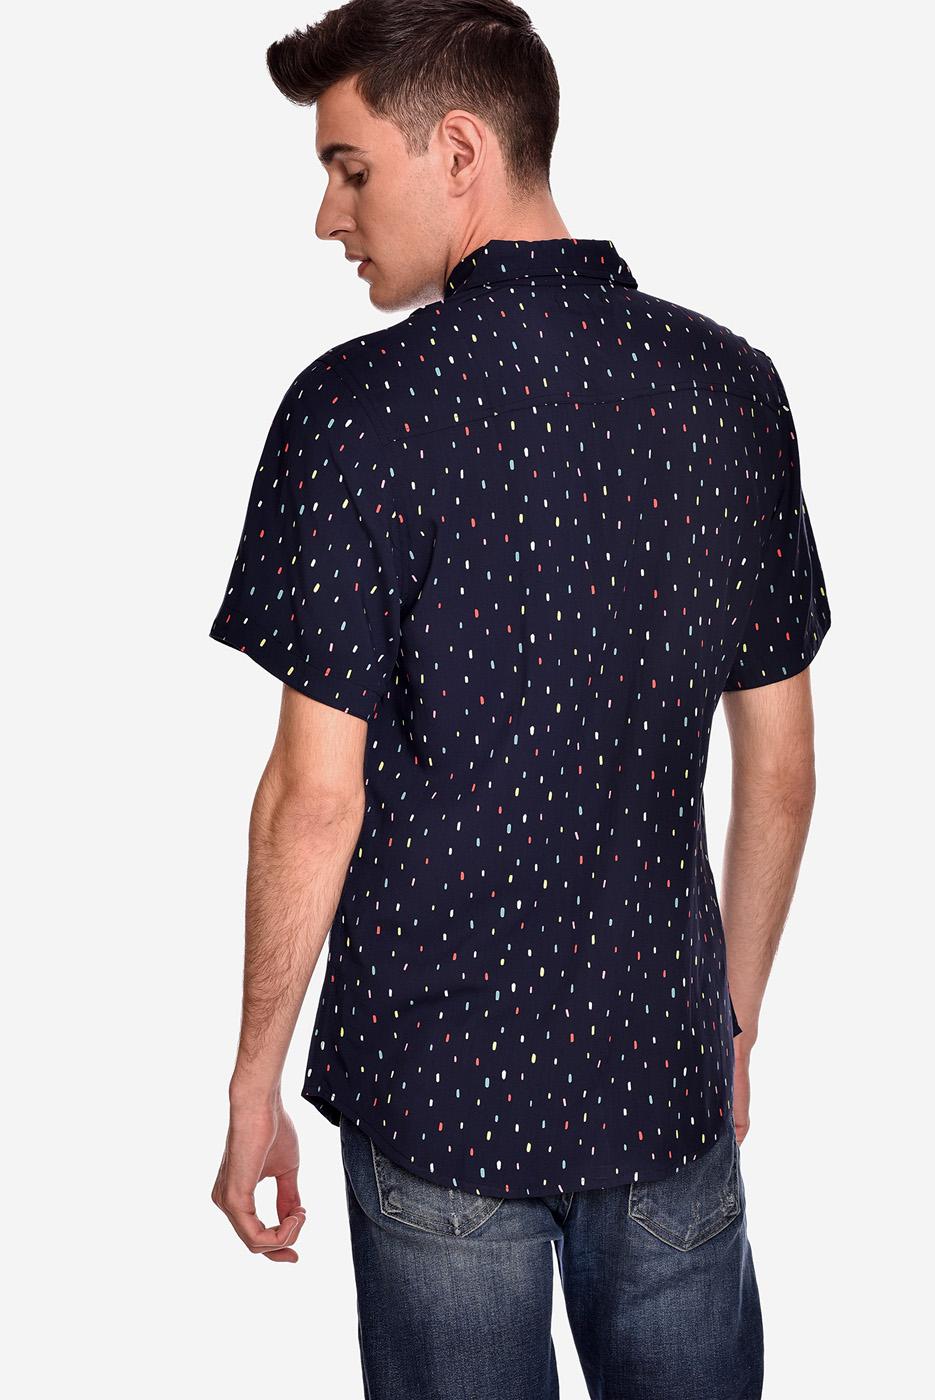 camisa-manga-corta-estampado-rock-lluvia-2